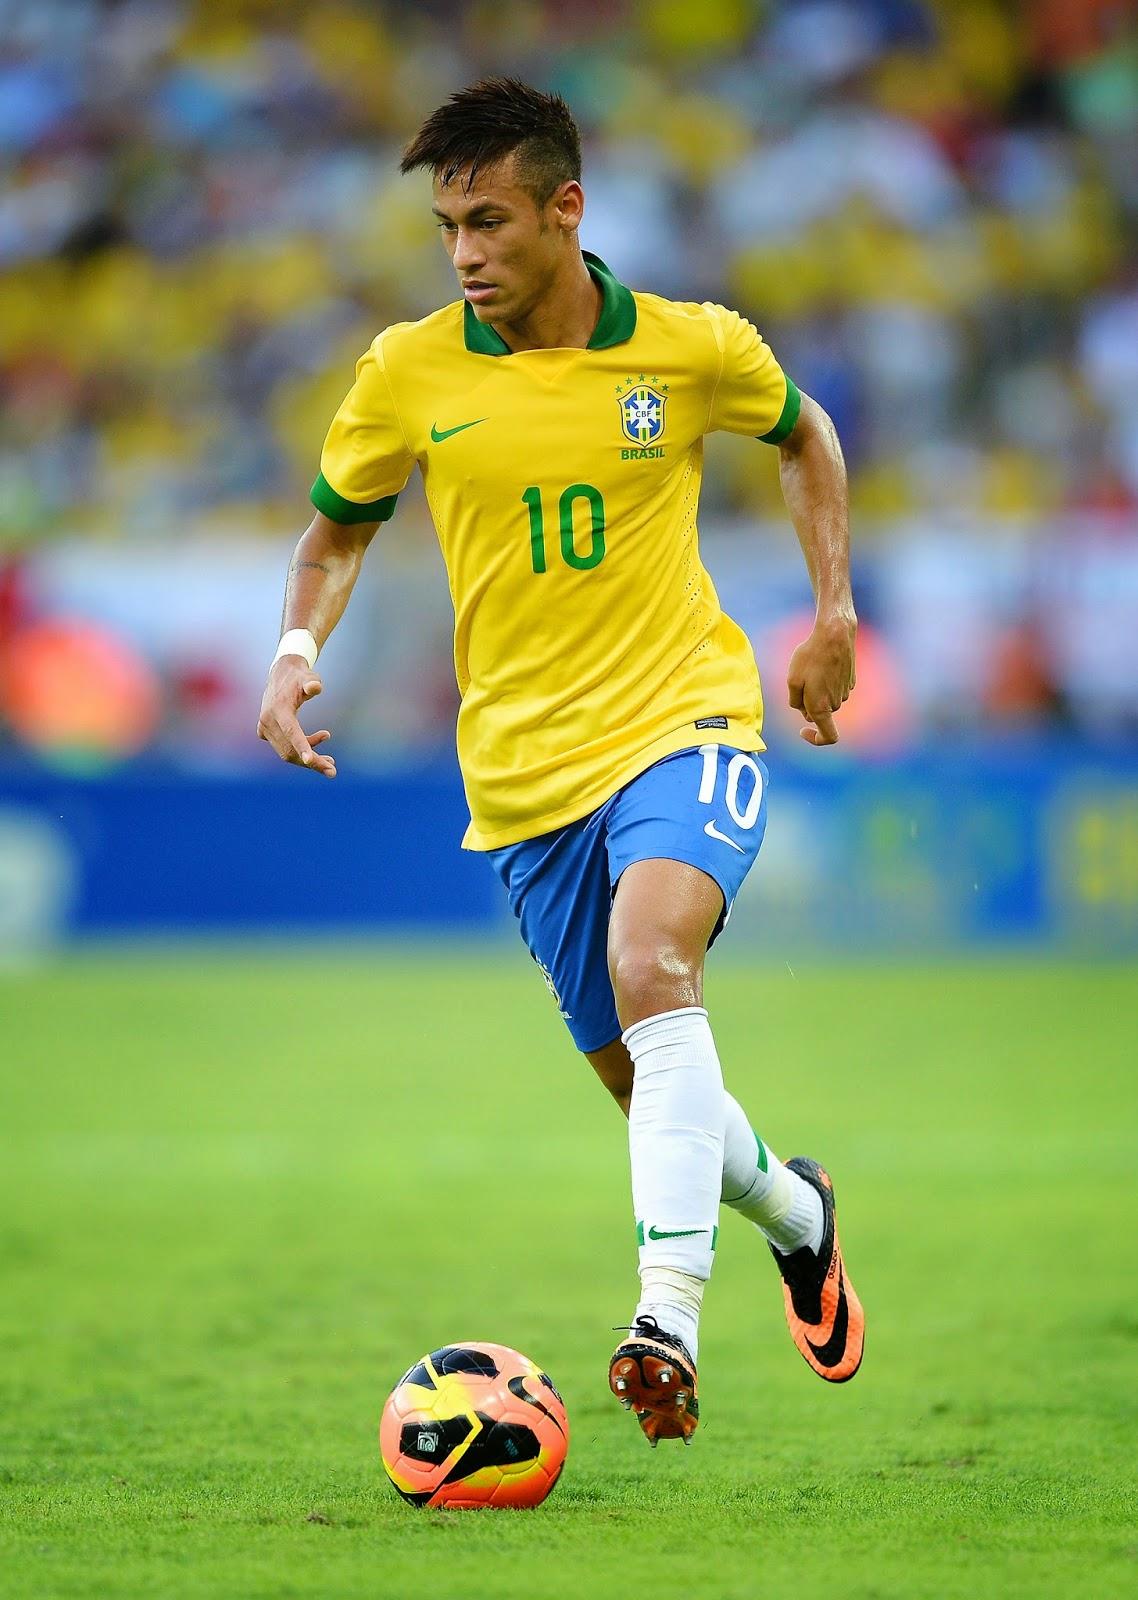 ALL SPORTS PLAYERS: Neymar Jr Very Great Footballer 2014Neymar Playing Soccer 2014